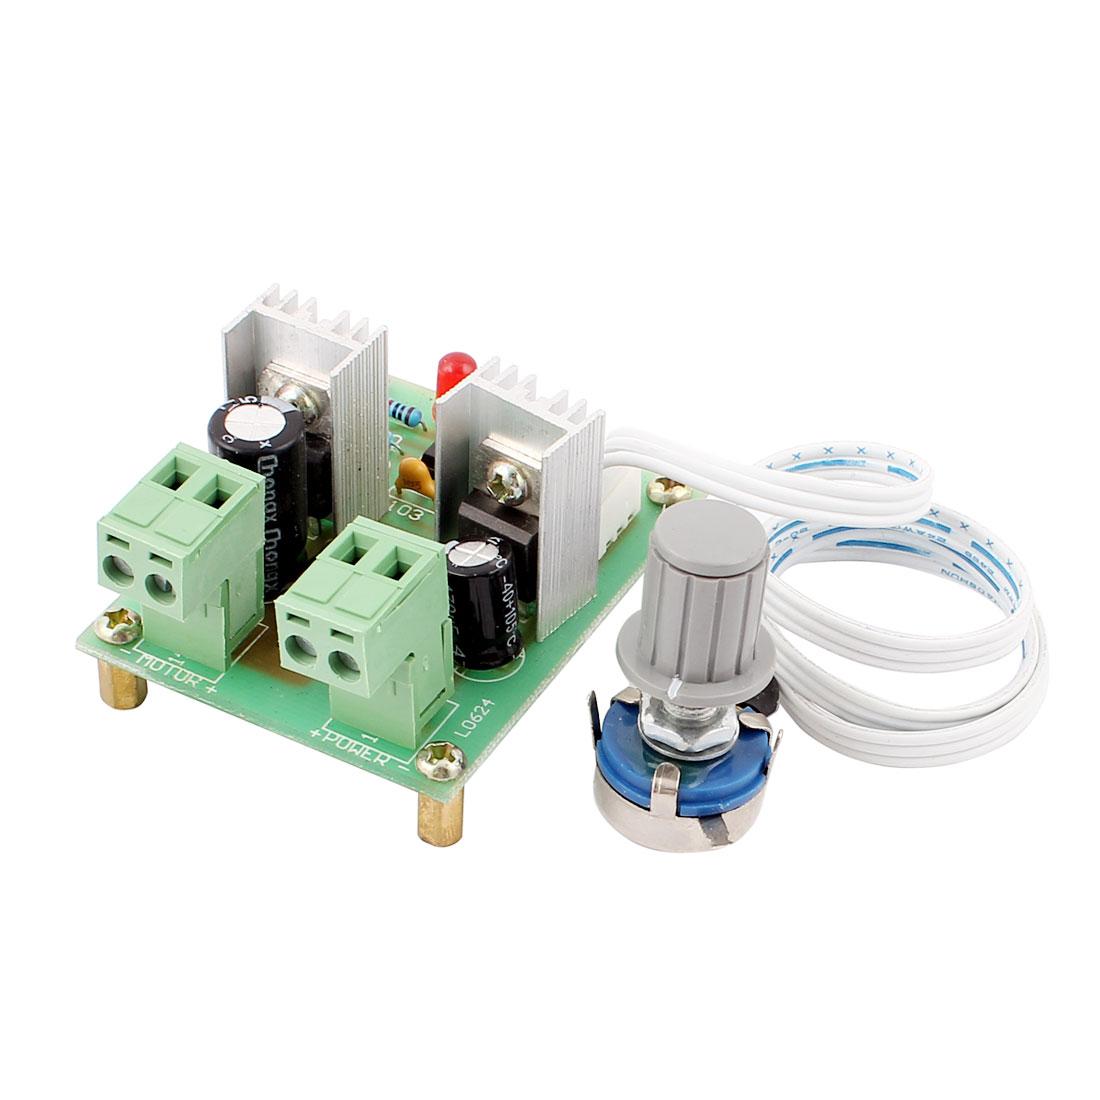 12V-36V 10A 200W Pulse Width Modulator PWM DC Motor Speed Controller